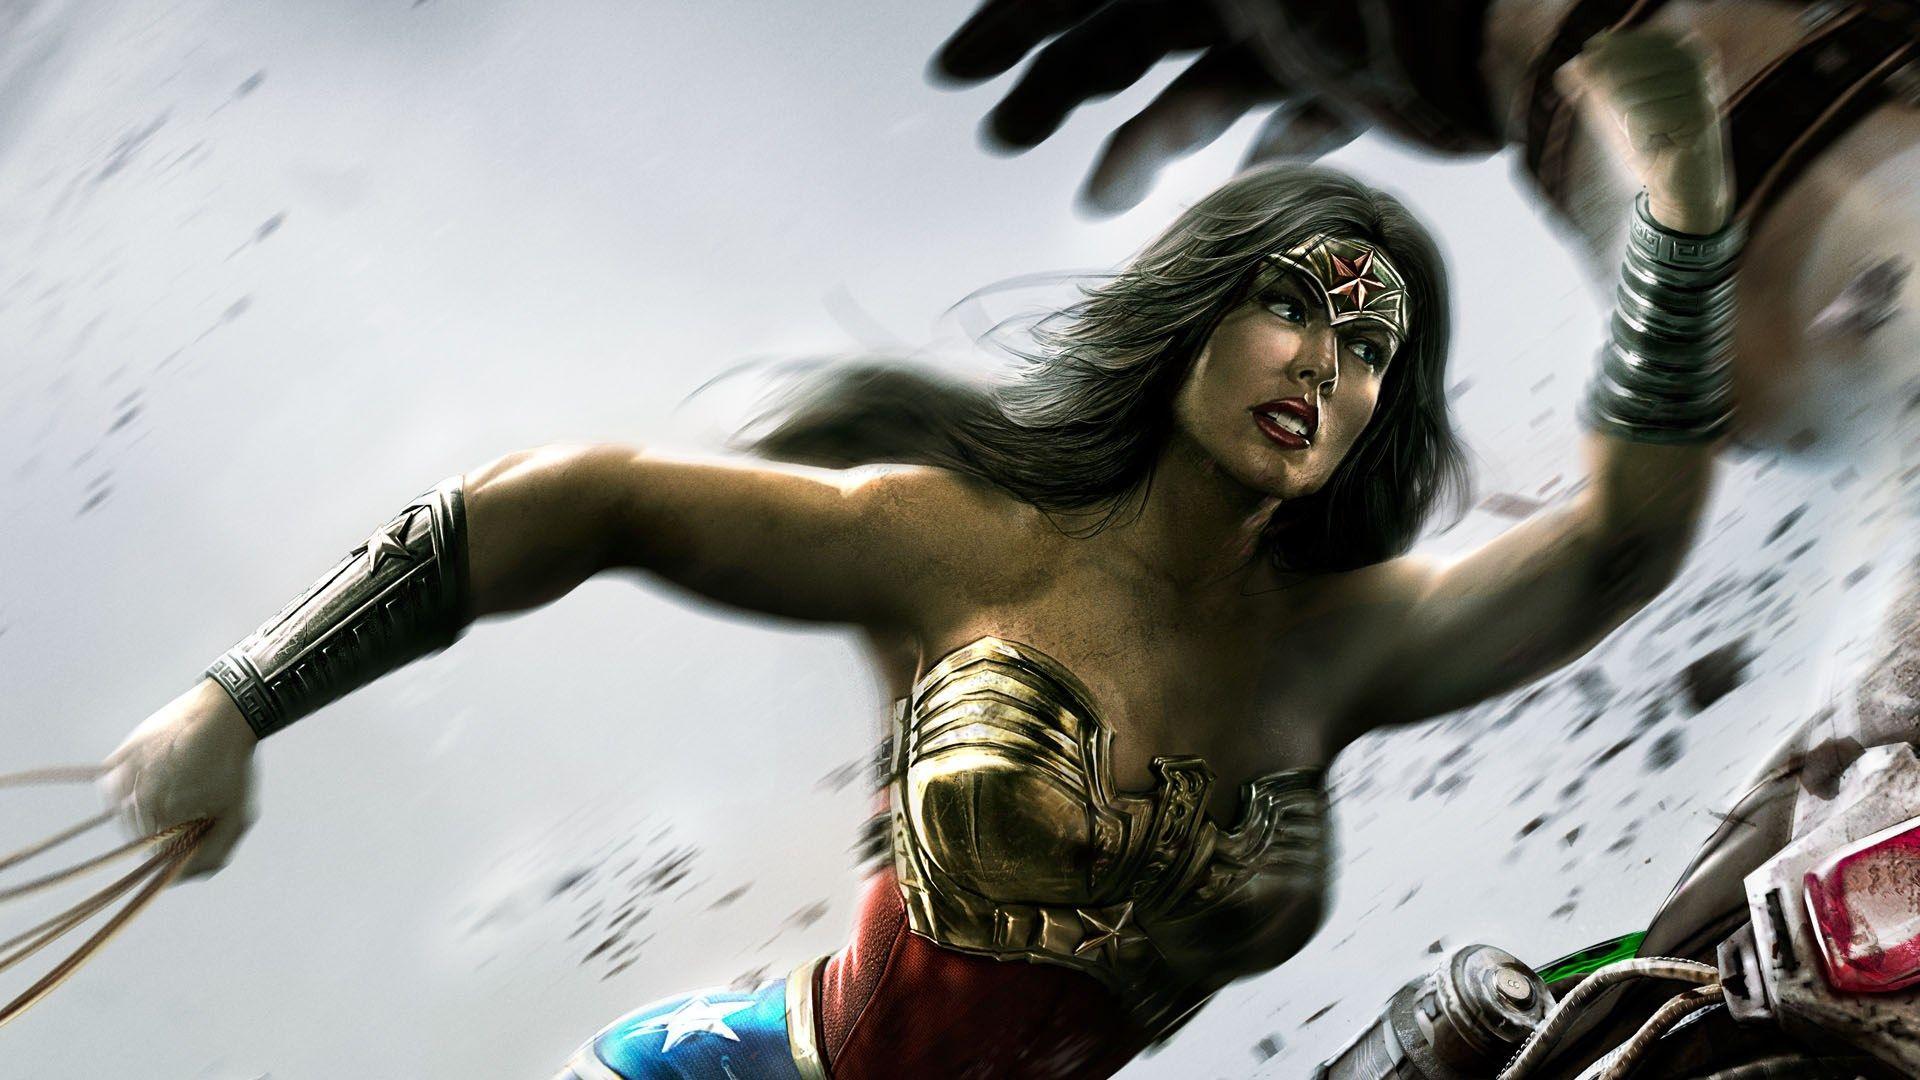 Injustice: Gods Among Us wallpaper pack 1080p hd, Ginger ...